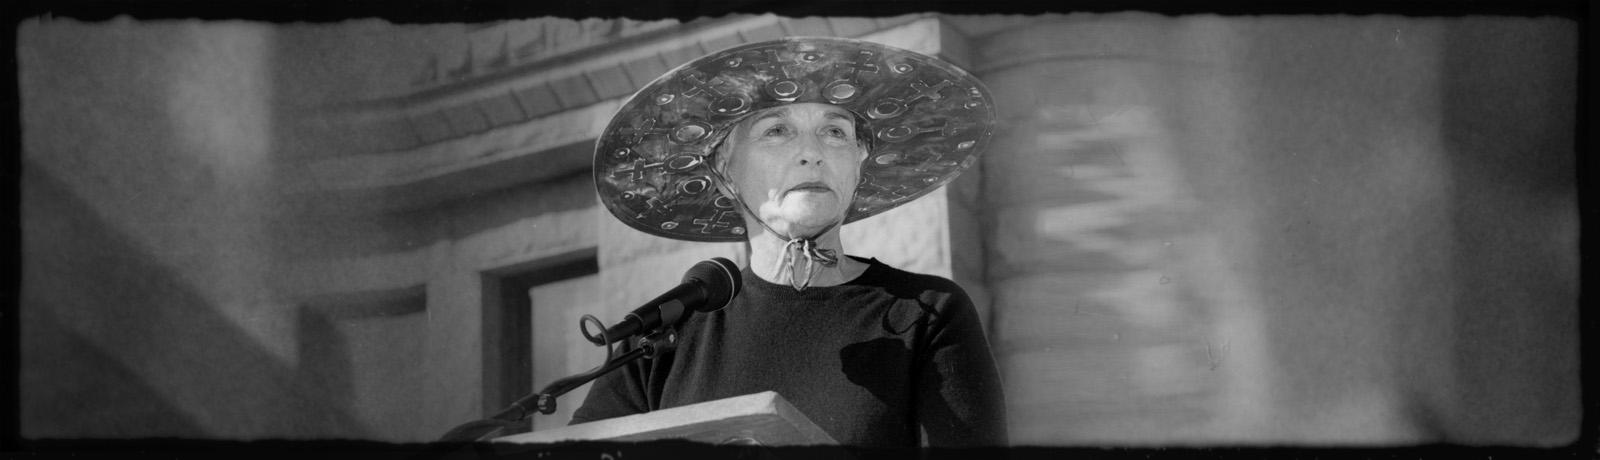 "In Memoriam: Frances ""Sissy"" Farenthold, 1926—2021"